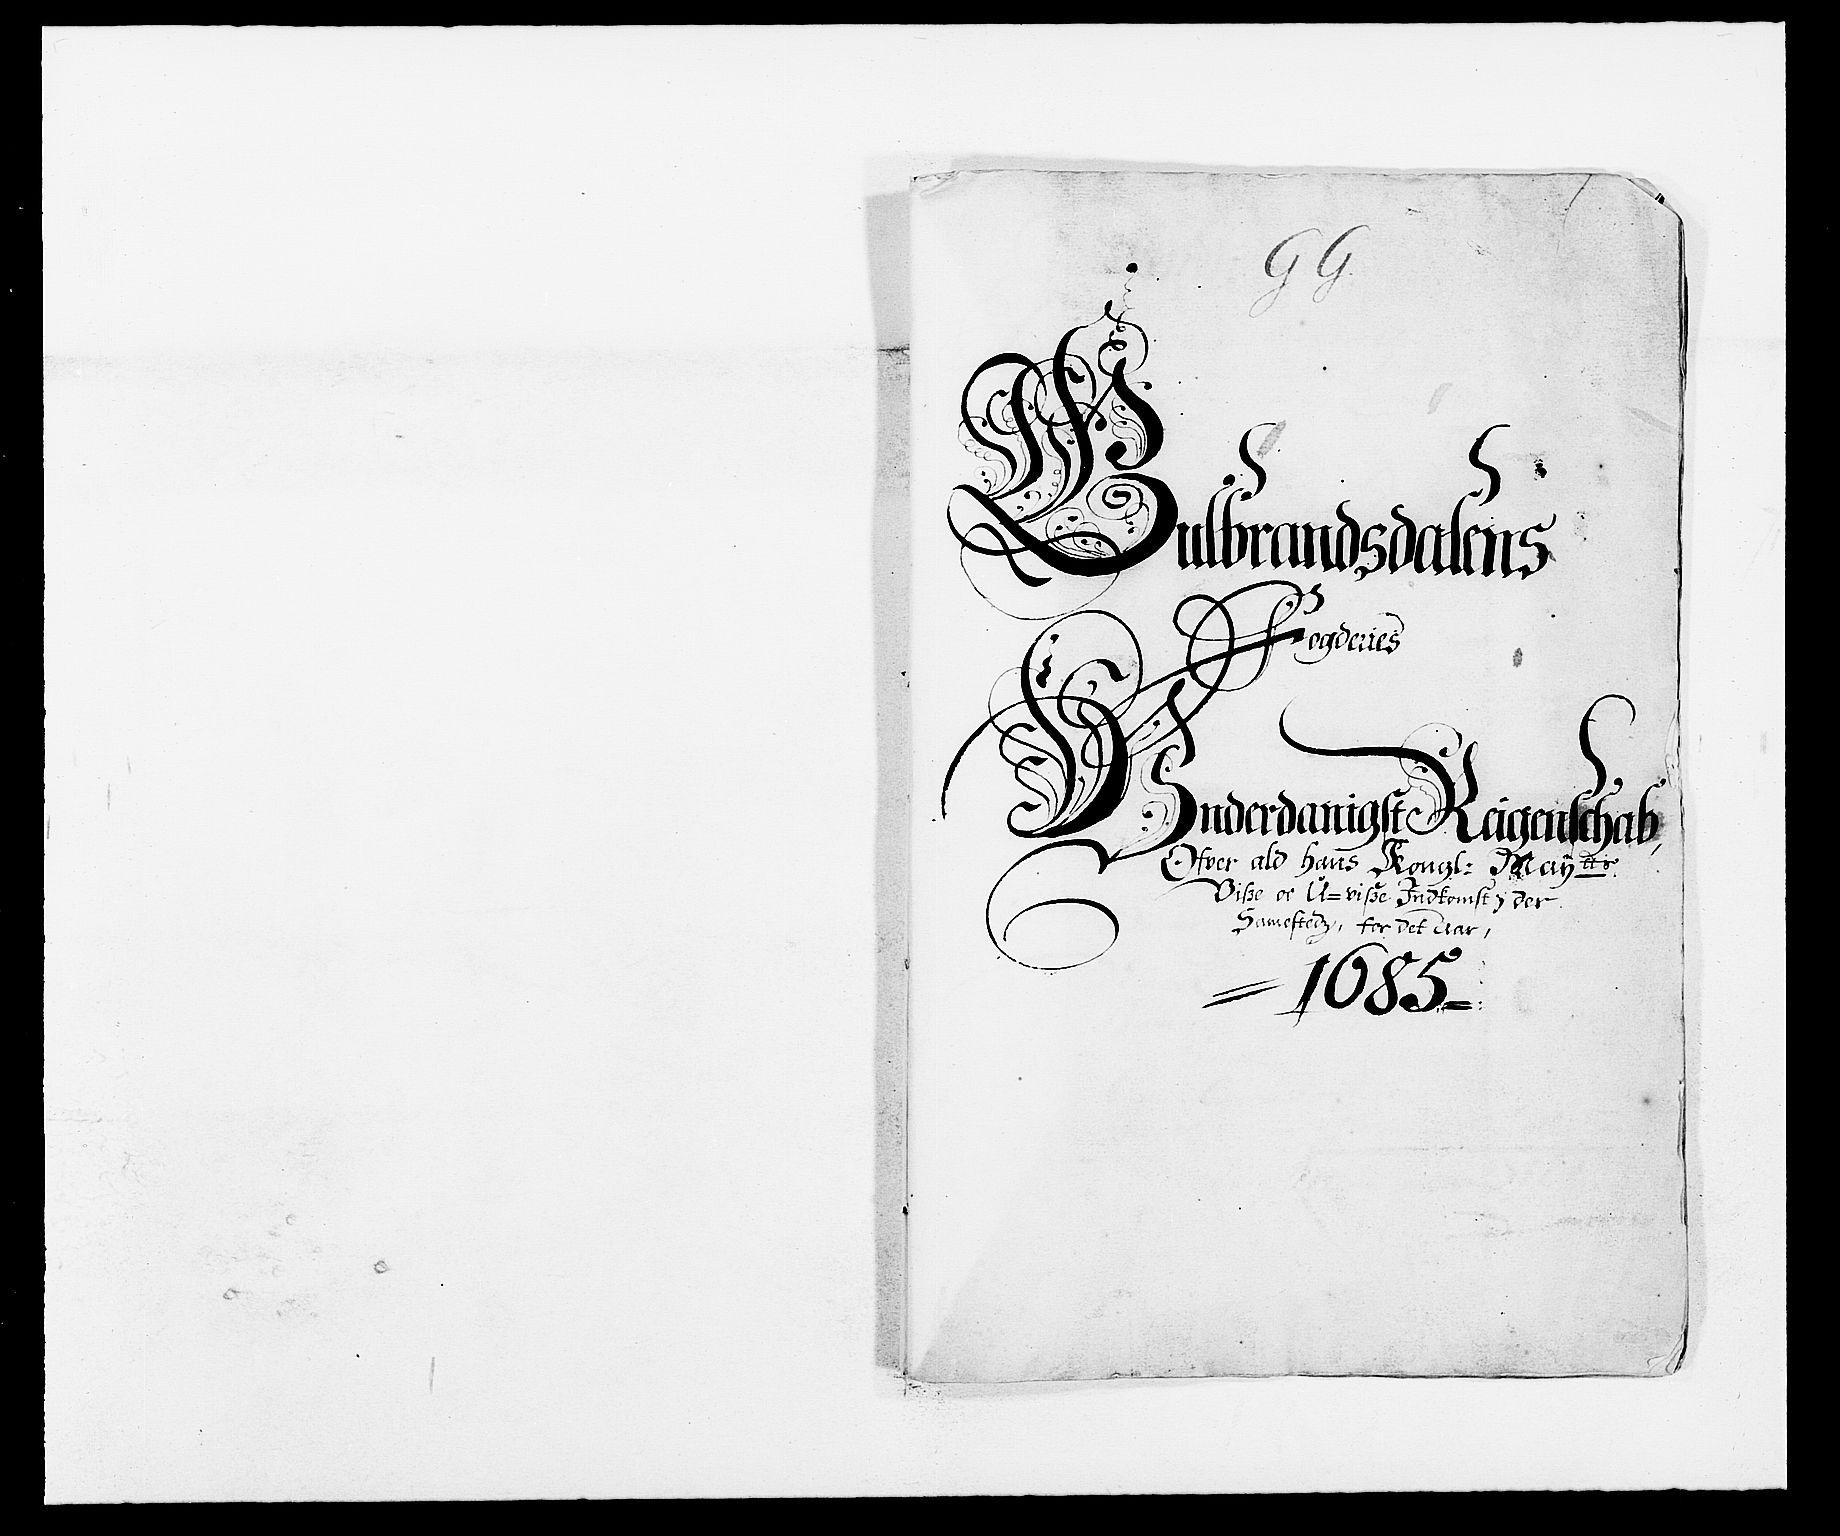 RA, Rentekammeret inntil 1814, Reviderte regnskaper, Fogderegnskap, R17/L1160: Fogderegnskap Gudbrandsdal, 1682-1689, s. 1